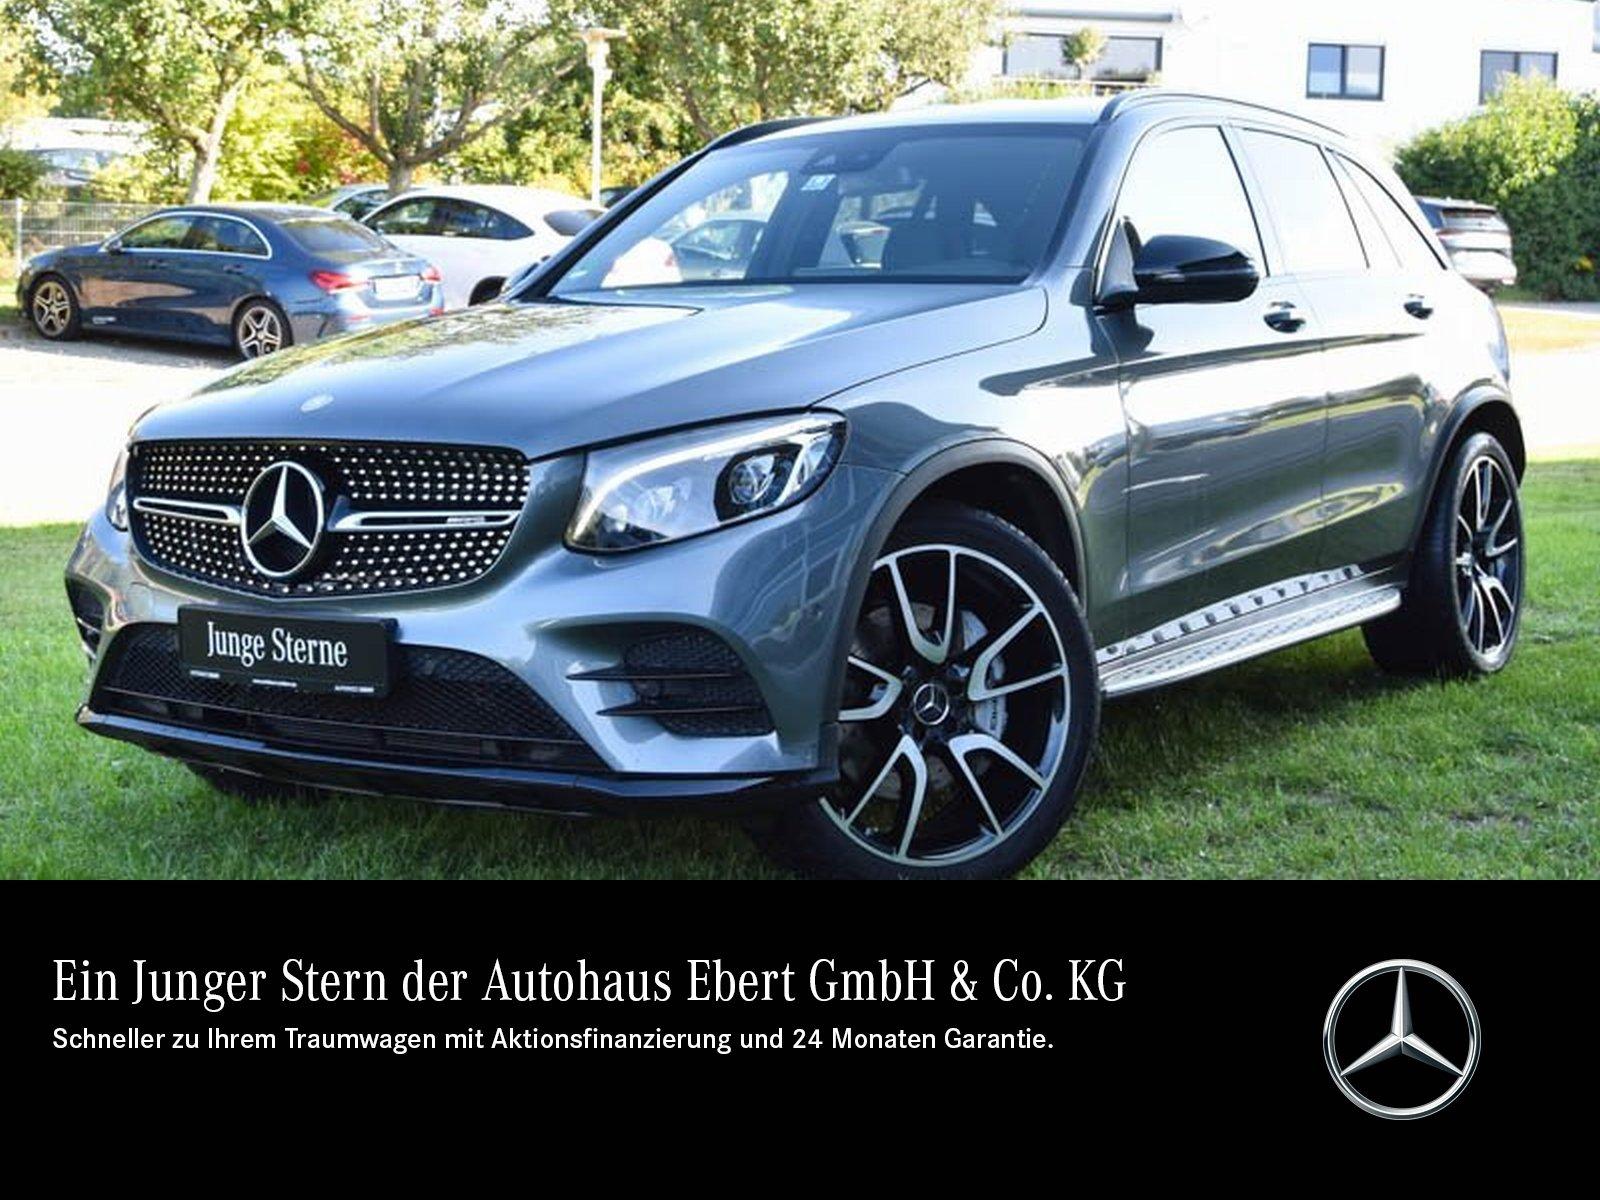 Mercedes-Benz GLC 43 4M AMG COMAND+BURMESTER+EASY+NIGHT+LED, Jahr 2017, Benzin